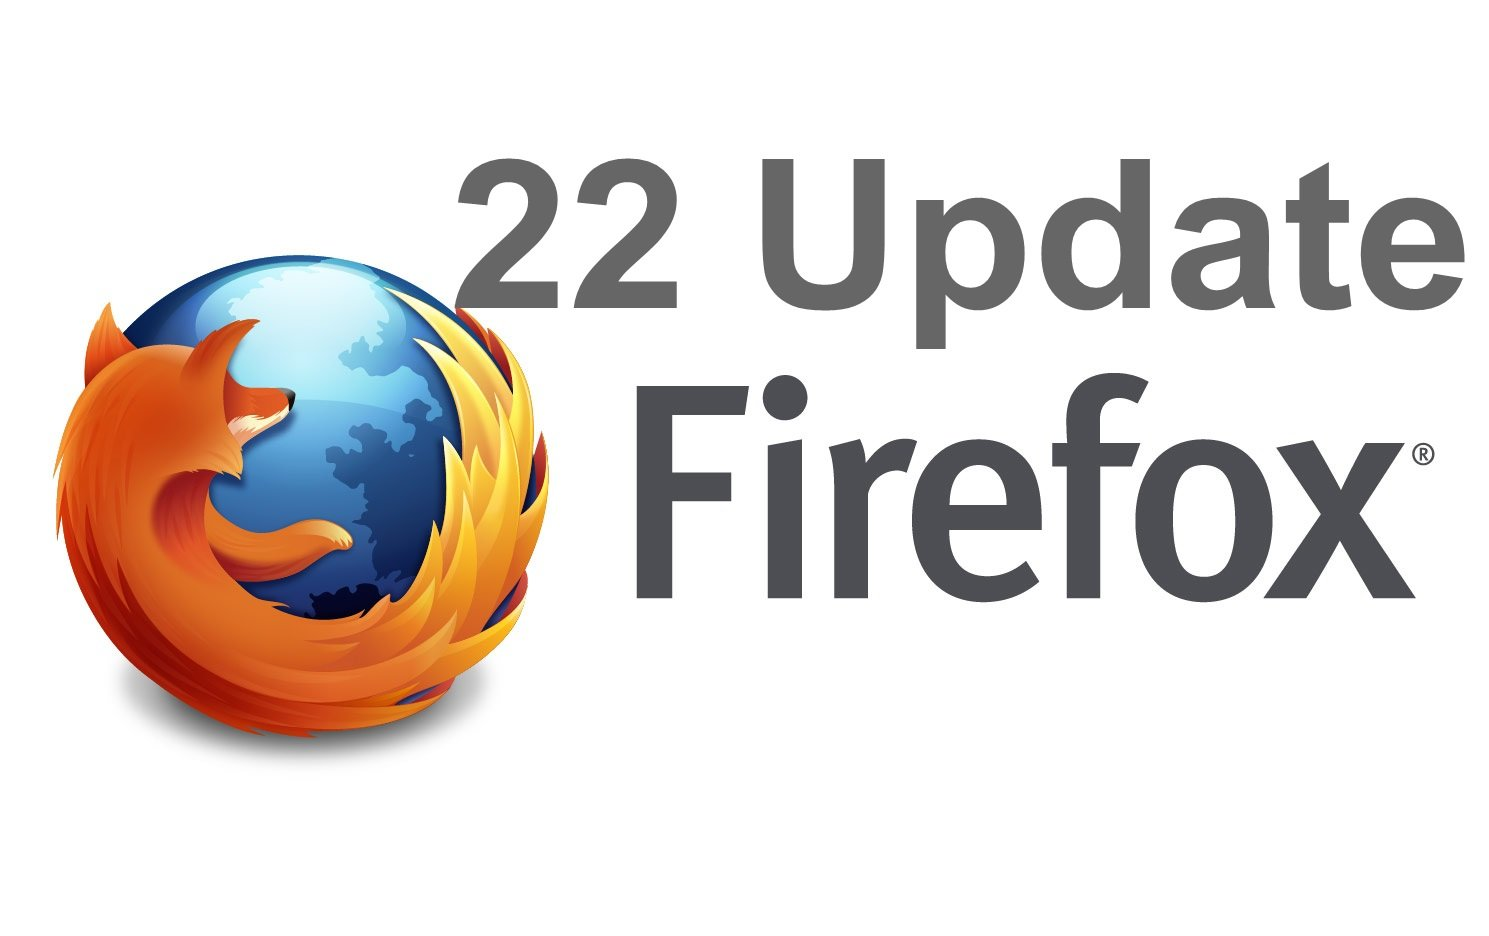 firefox_logo-wordmark-horiz_rgb11